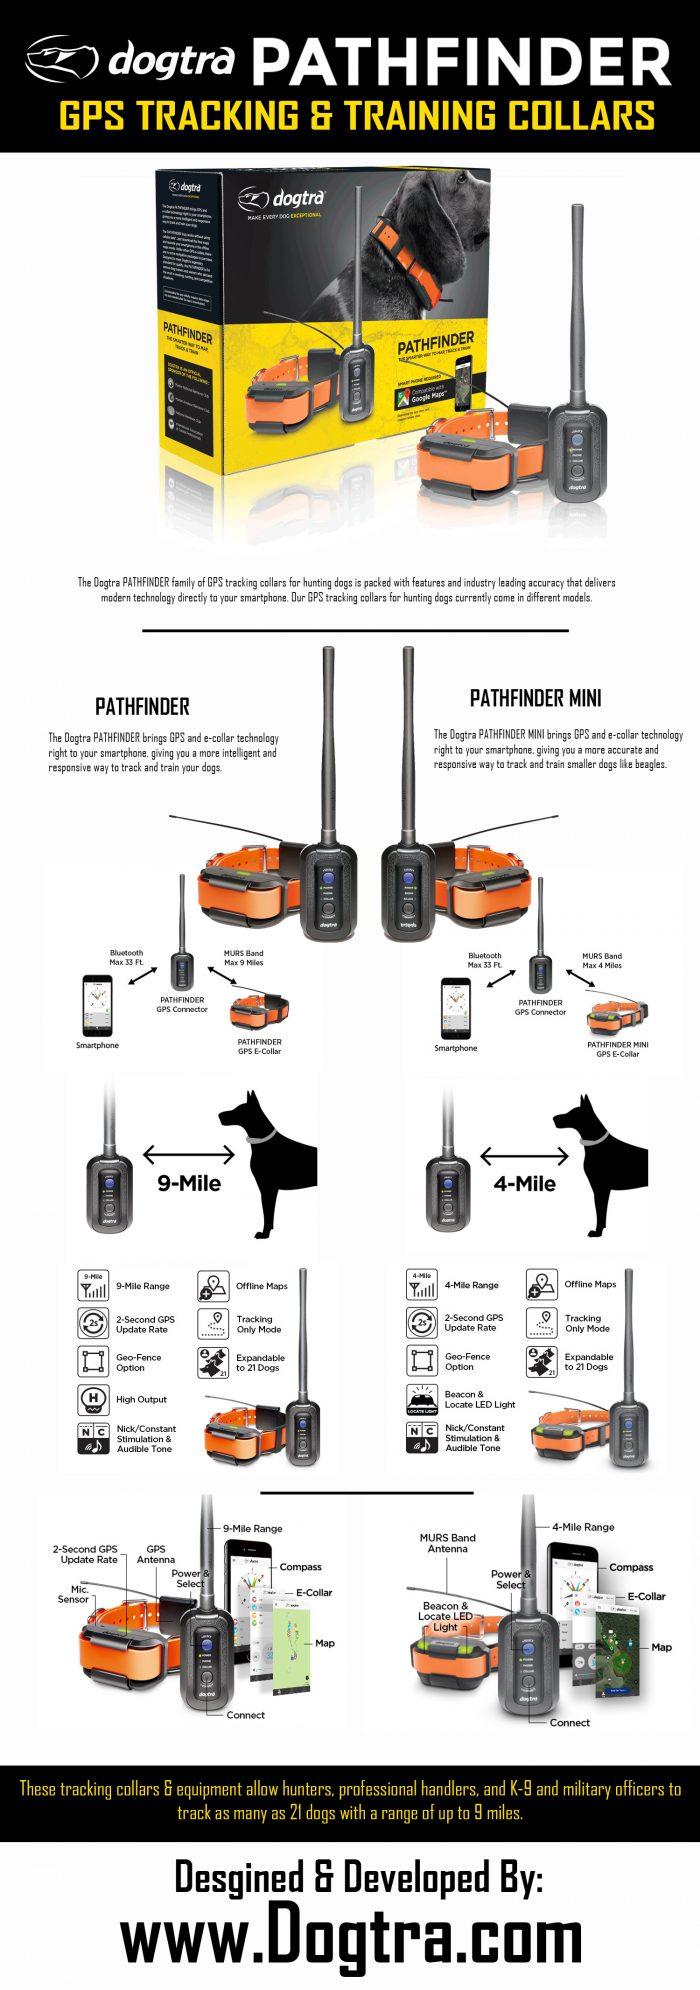 GPS TRACKING & TRAINING COLLARS